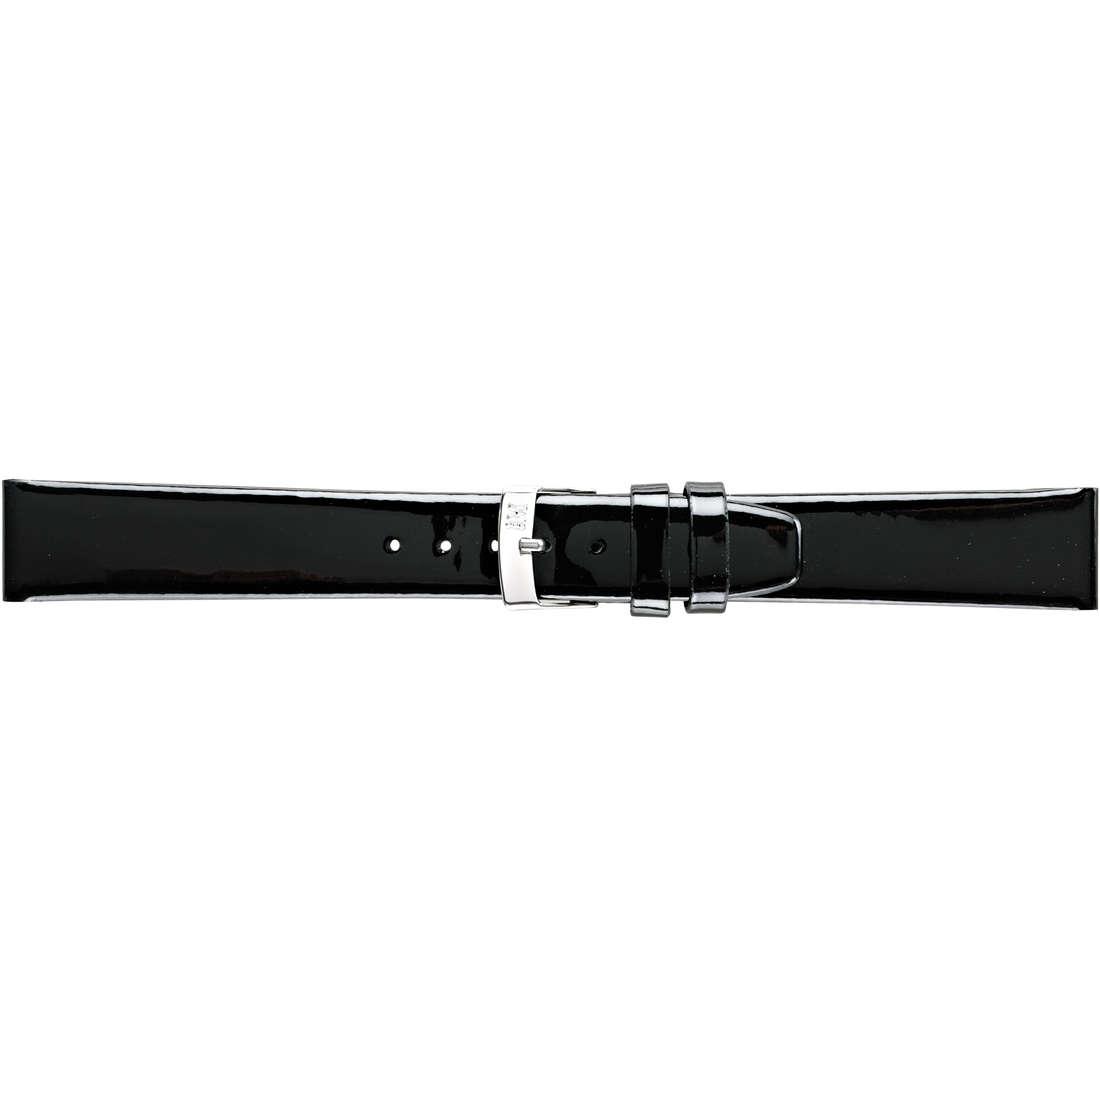 watch watch bands watch straps woman Morellato Morellato 1930 A01D3642A28019CR18